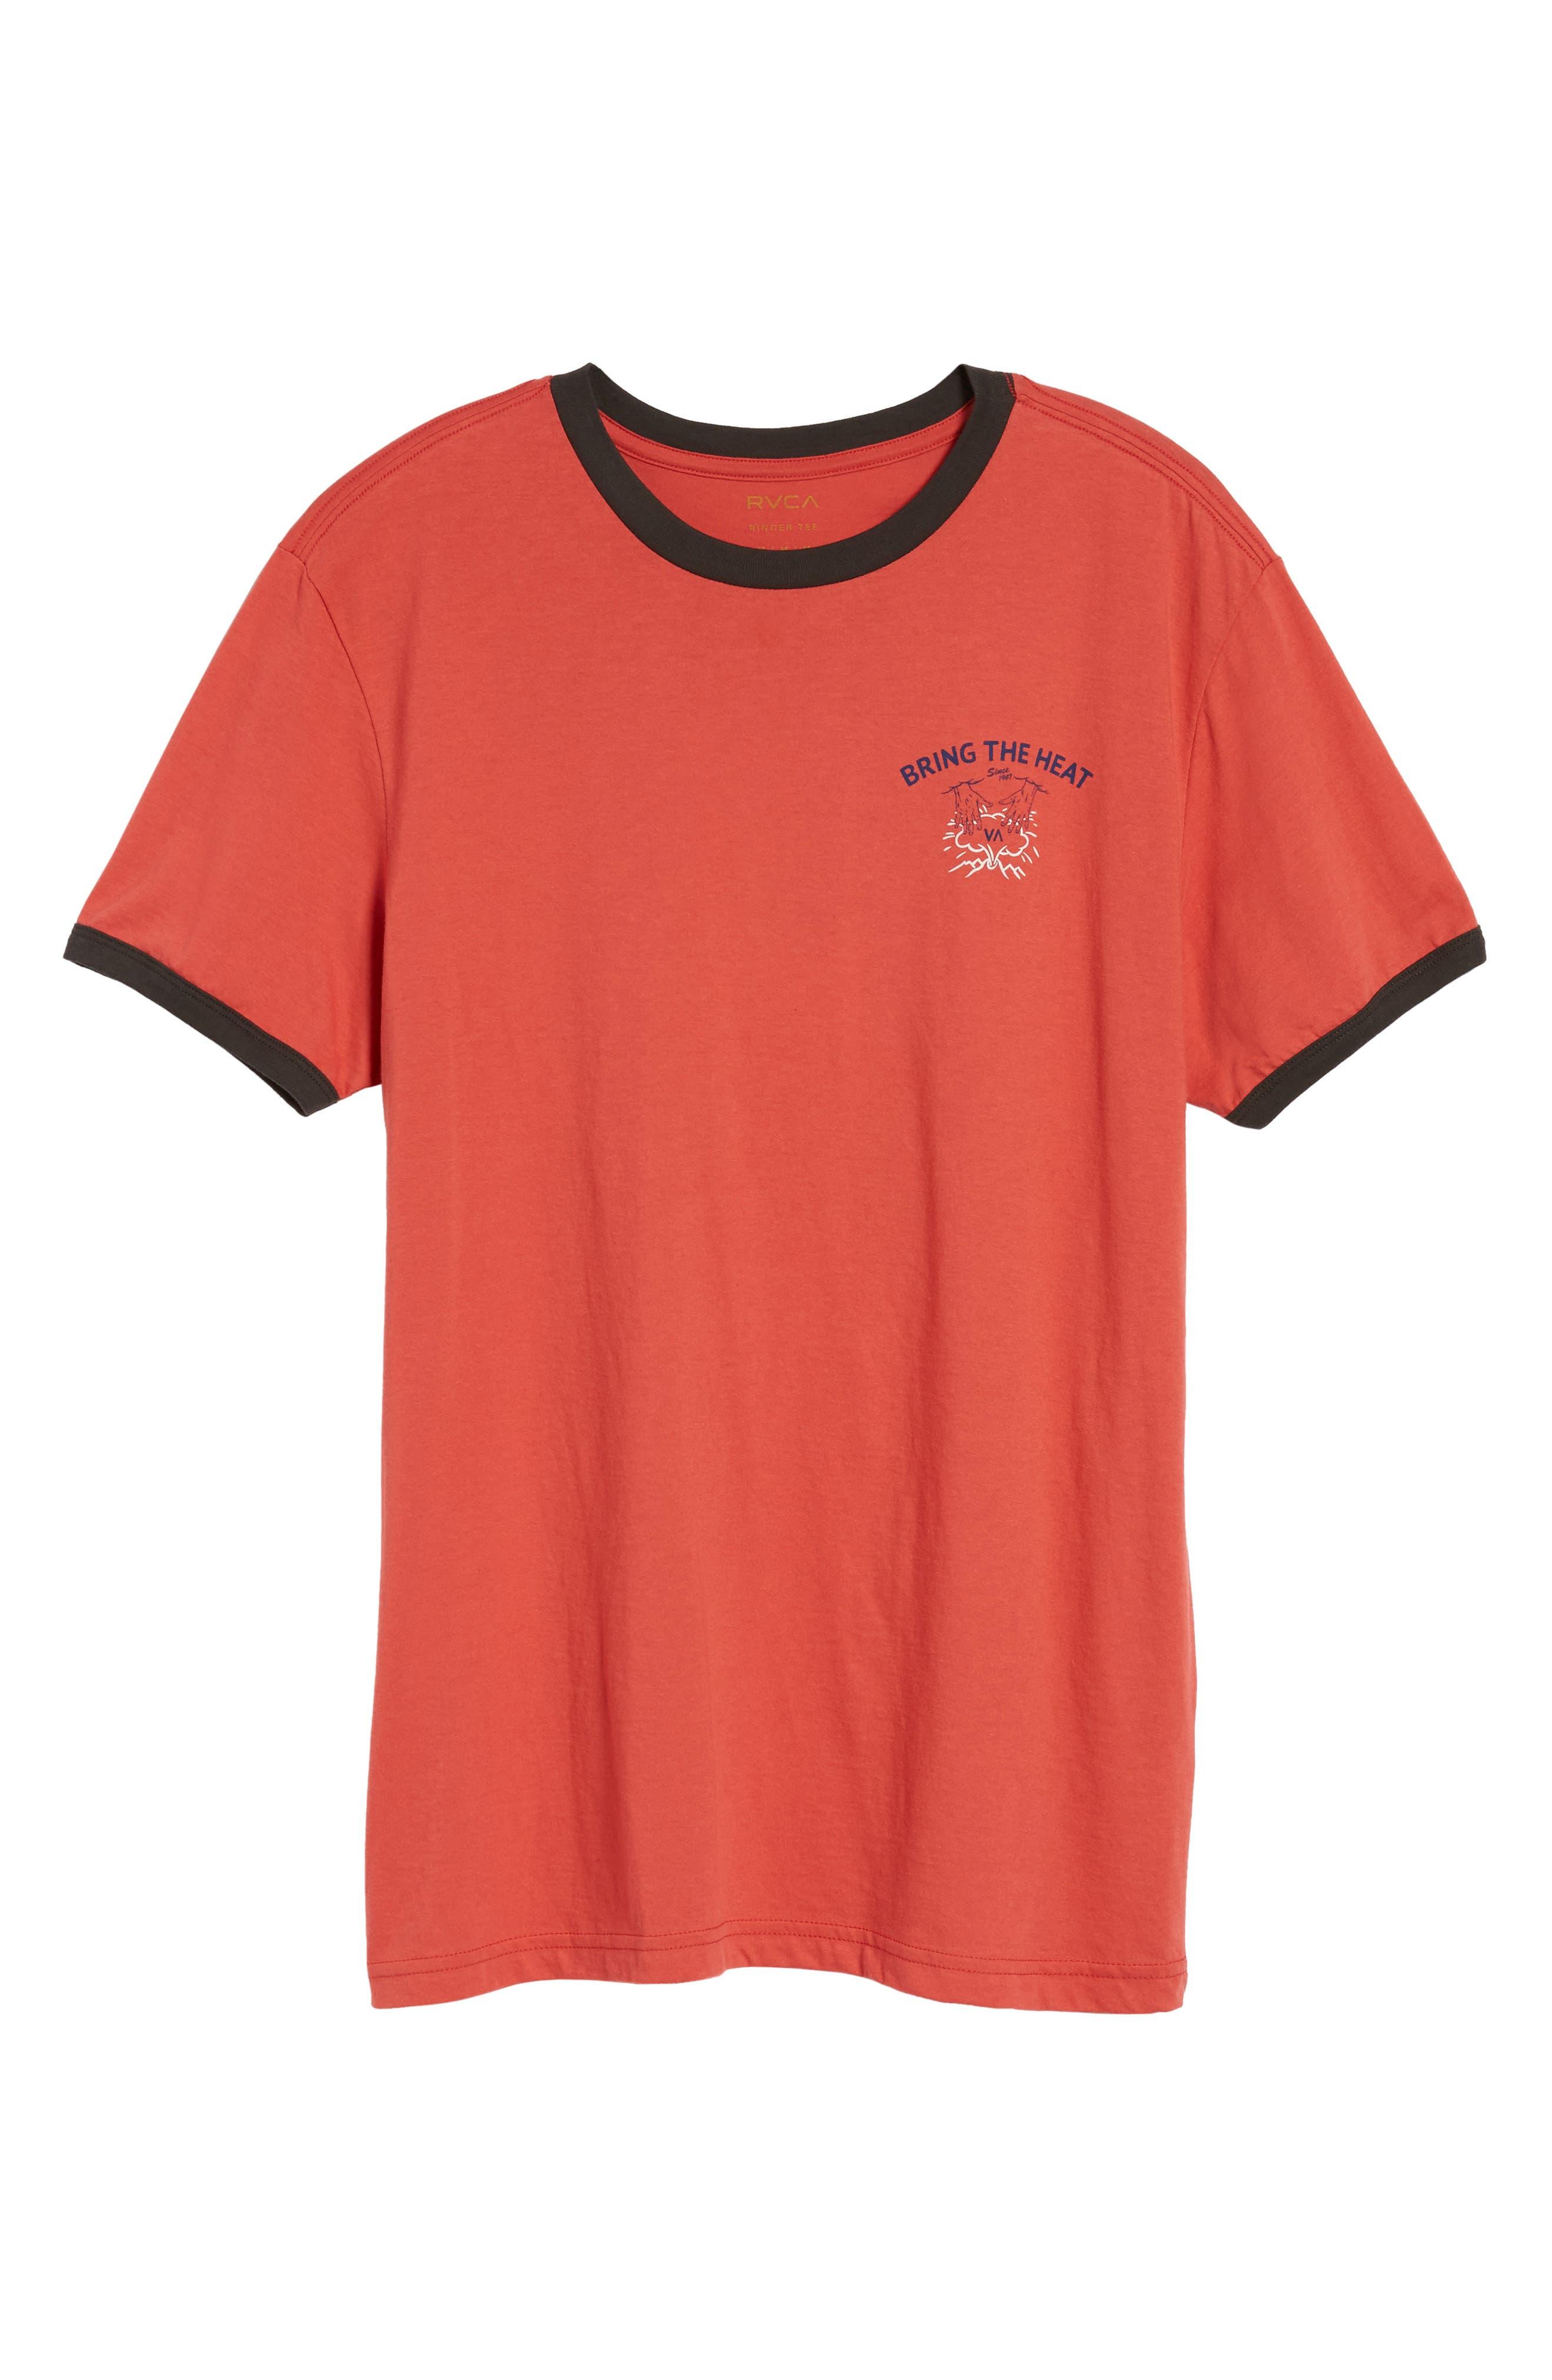 Bringing the Heat T-Shirt,                             Alternate thumbnail 6, color,                             Rosewood